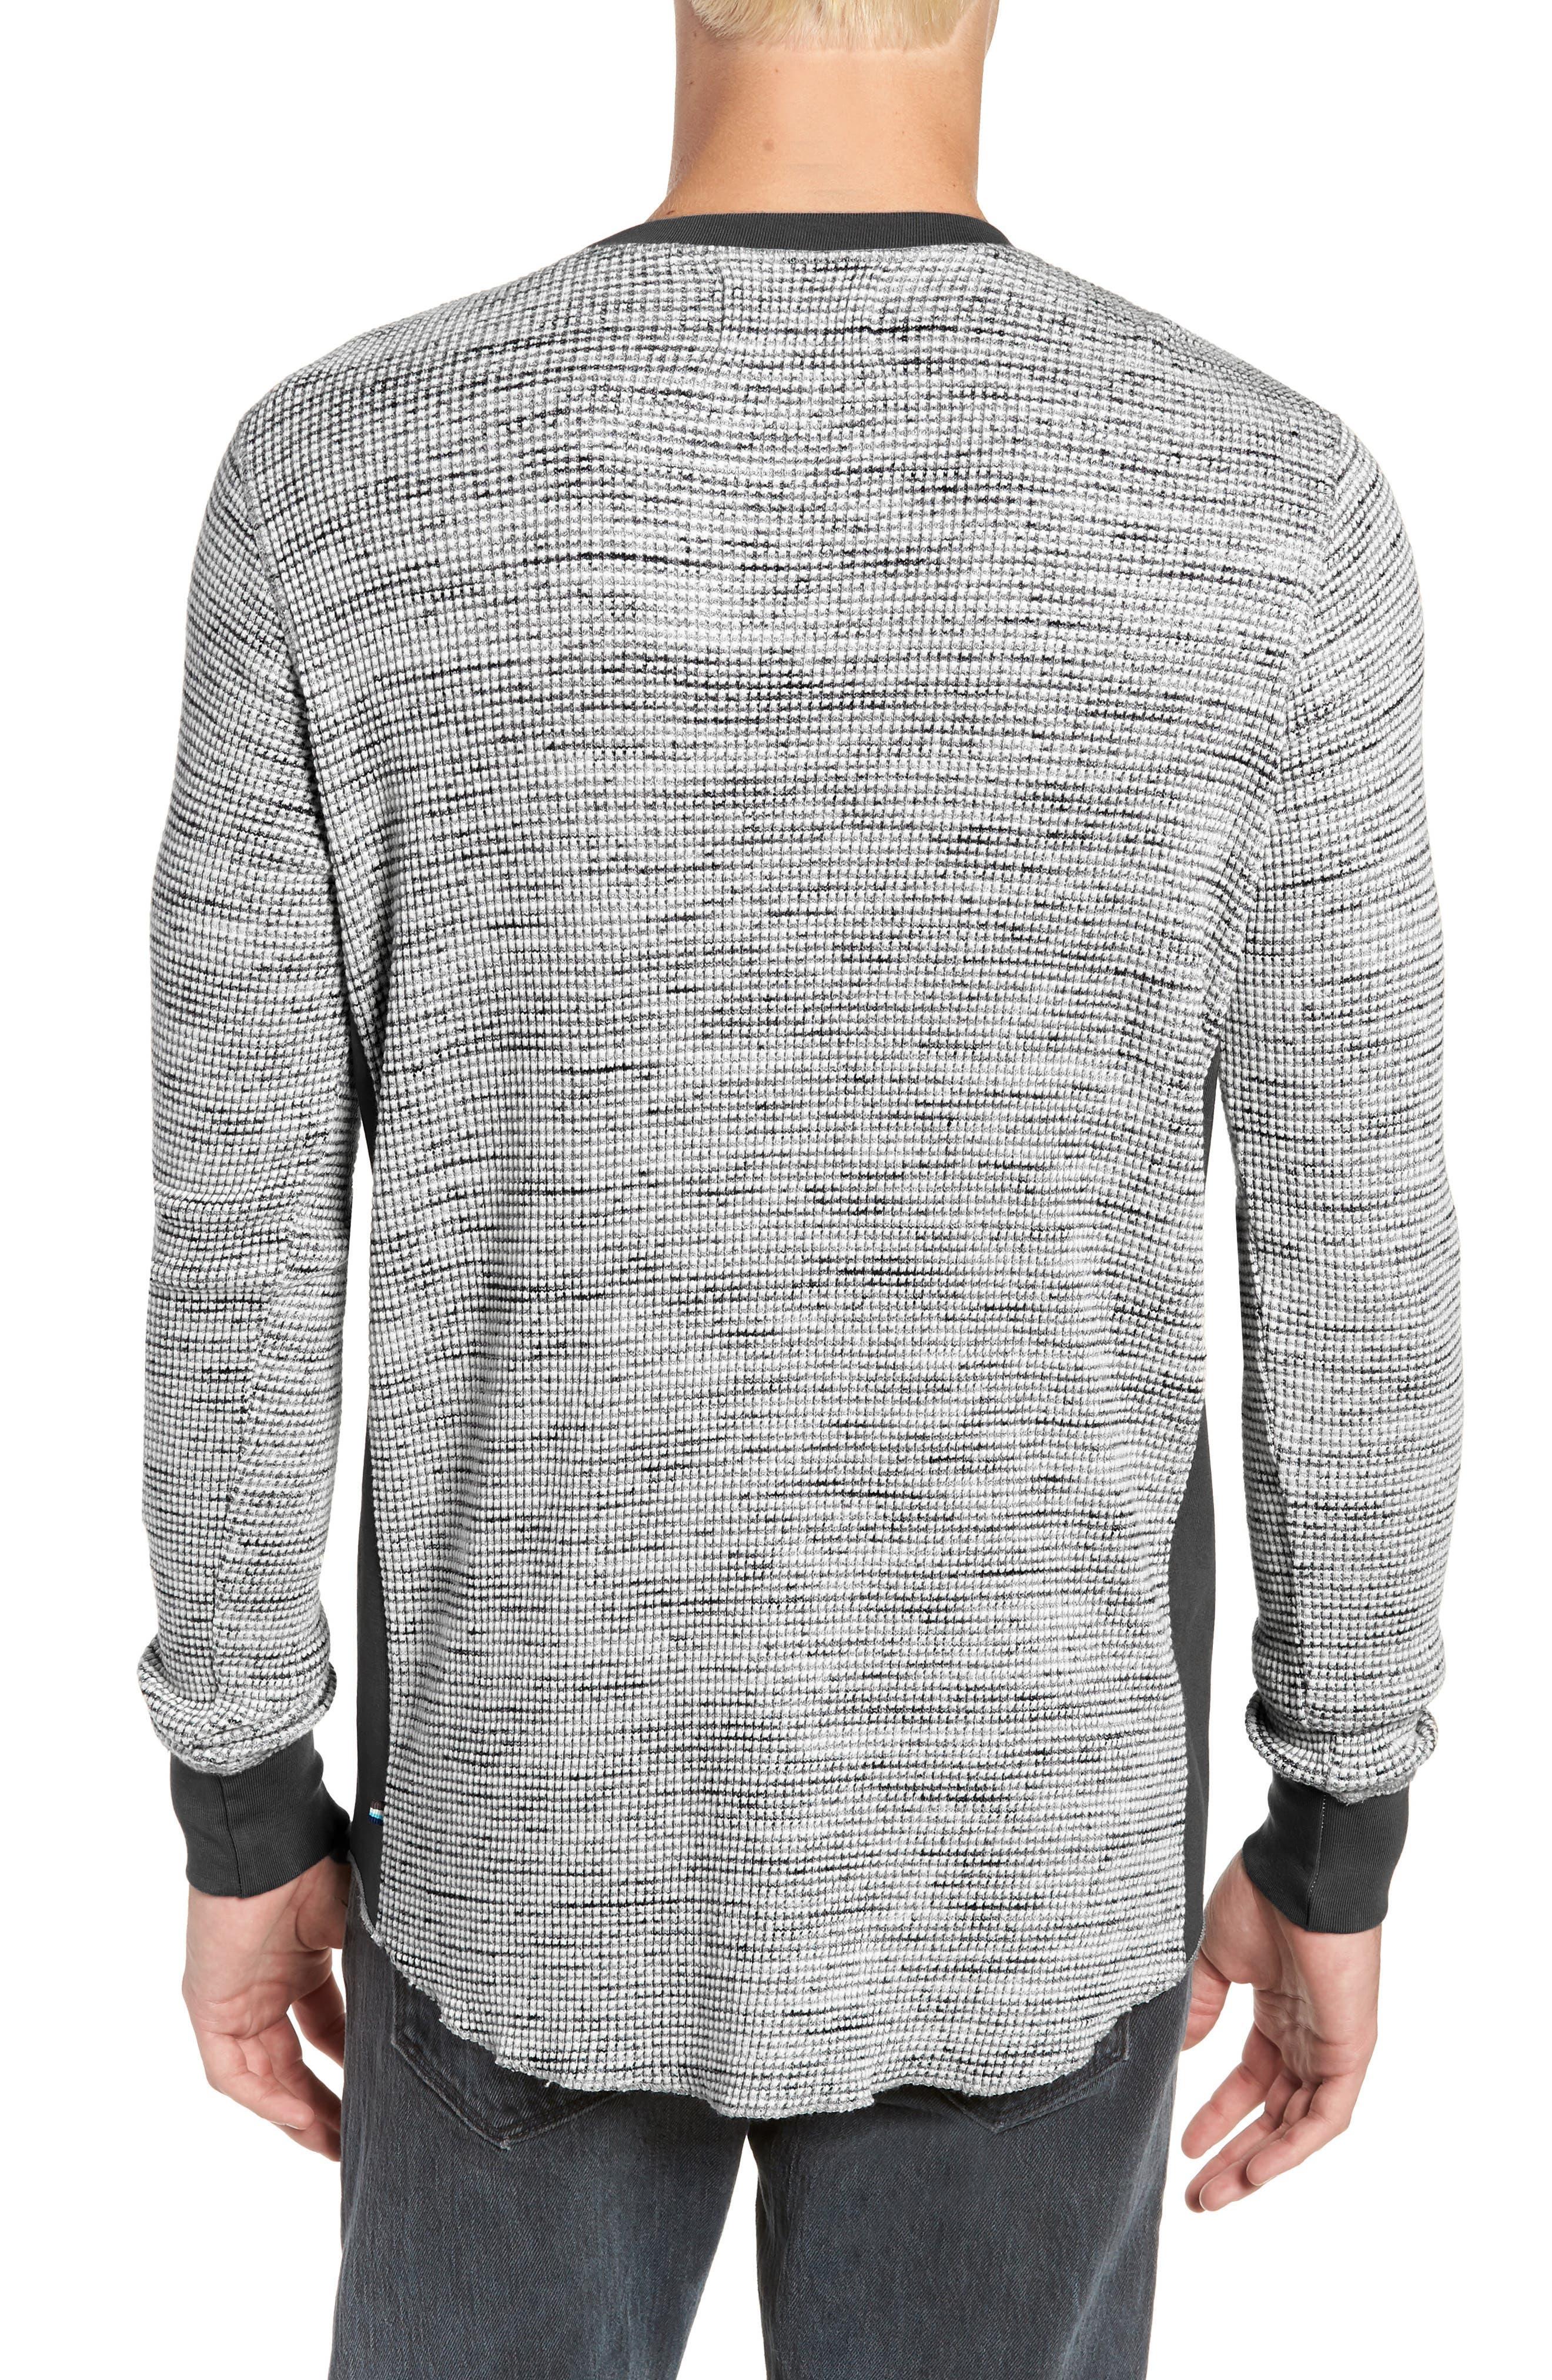 Neps Longline Thermal Shirt,                             Alternate thumbnail 2, color,                             020